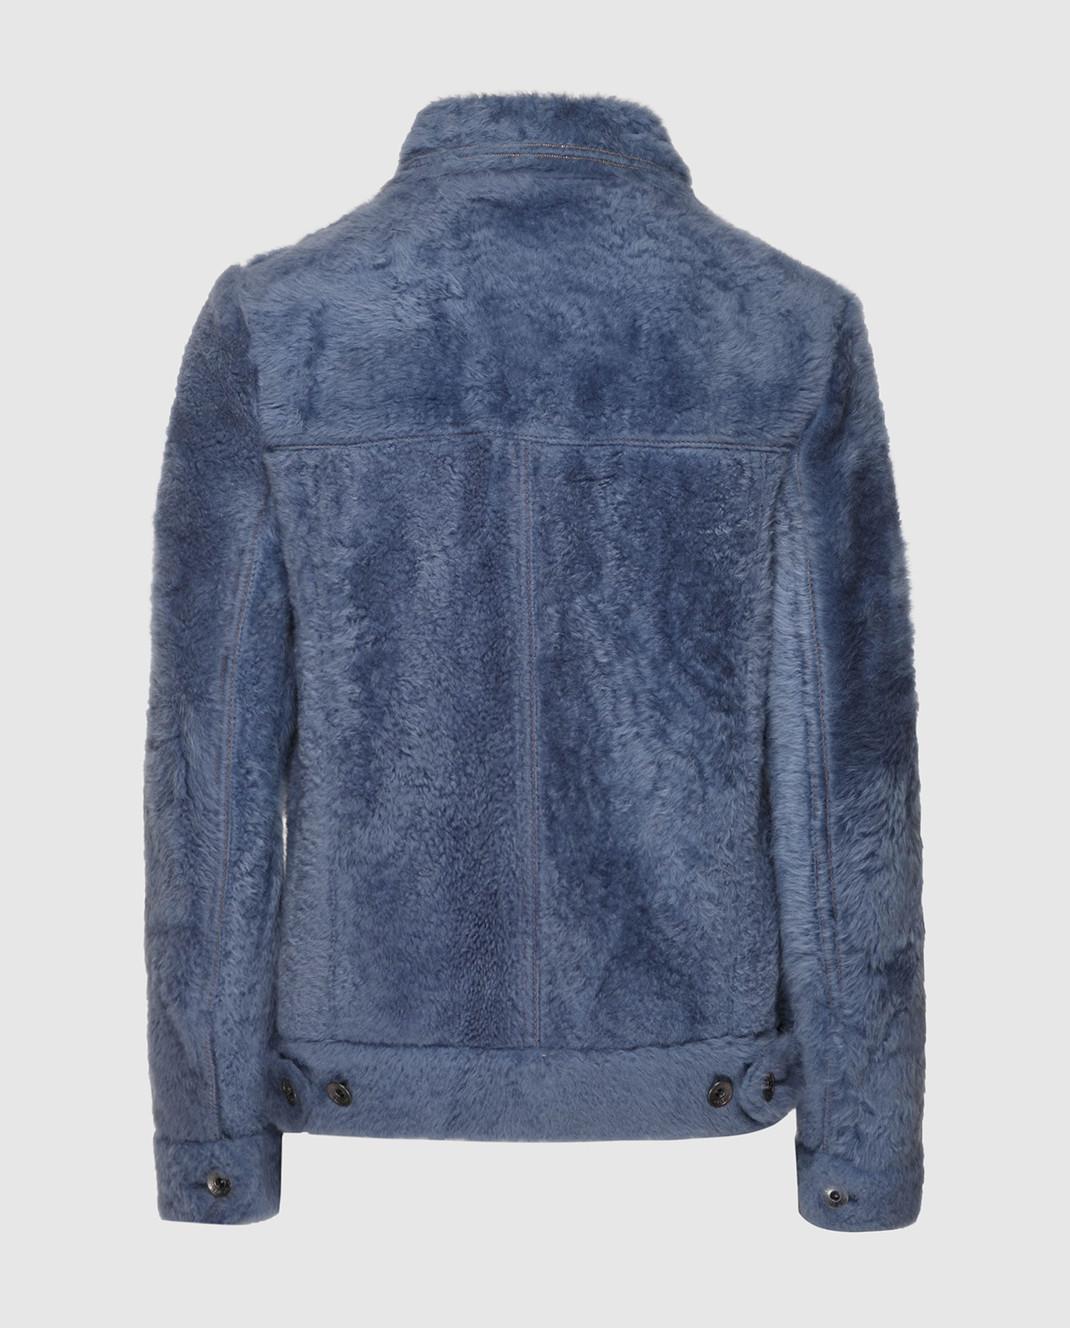 Brunello Cucinelli Синяя куртка MPMTE8527P изображение 2